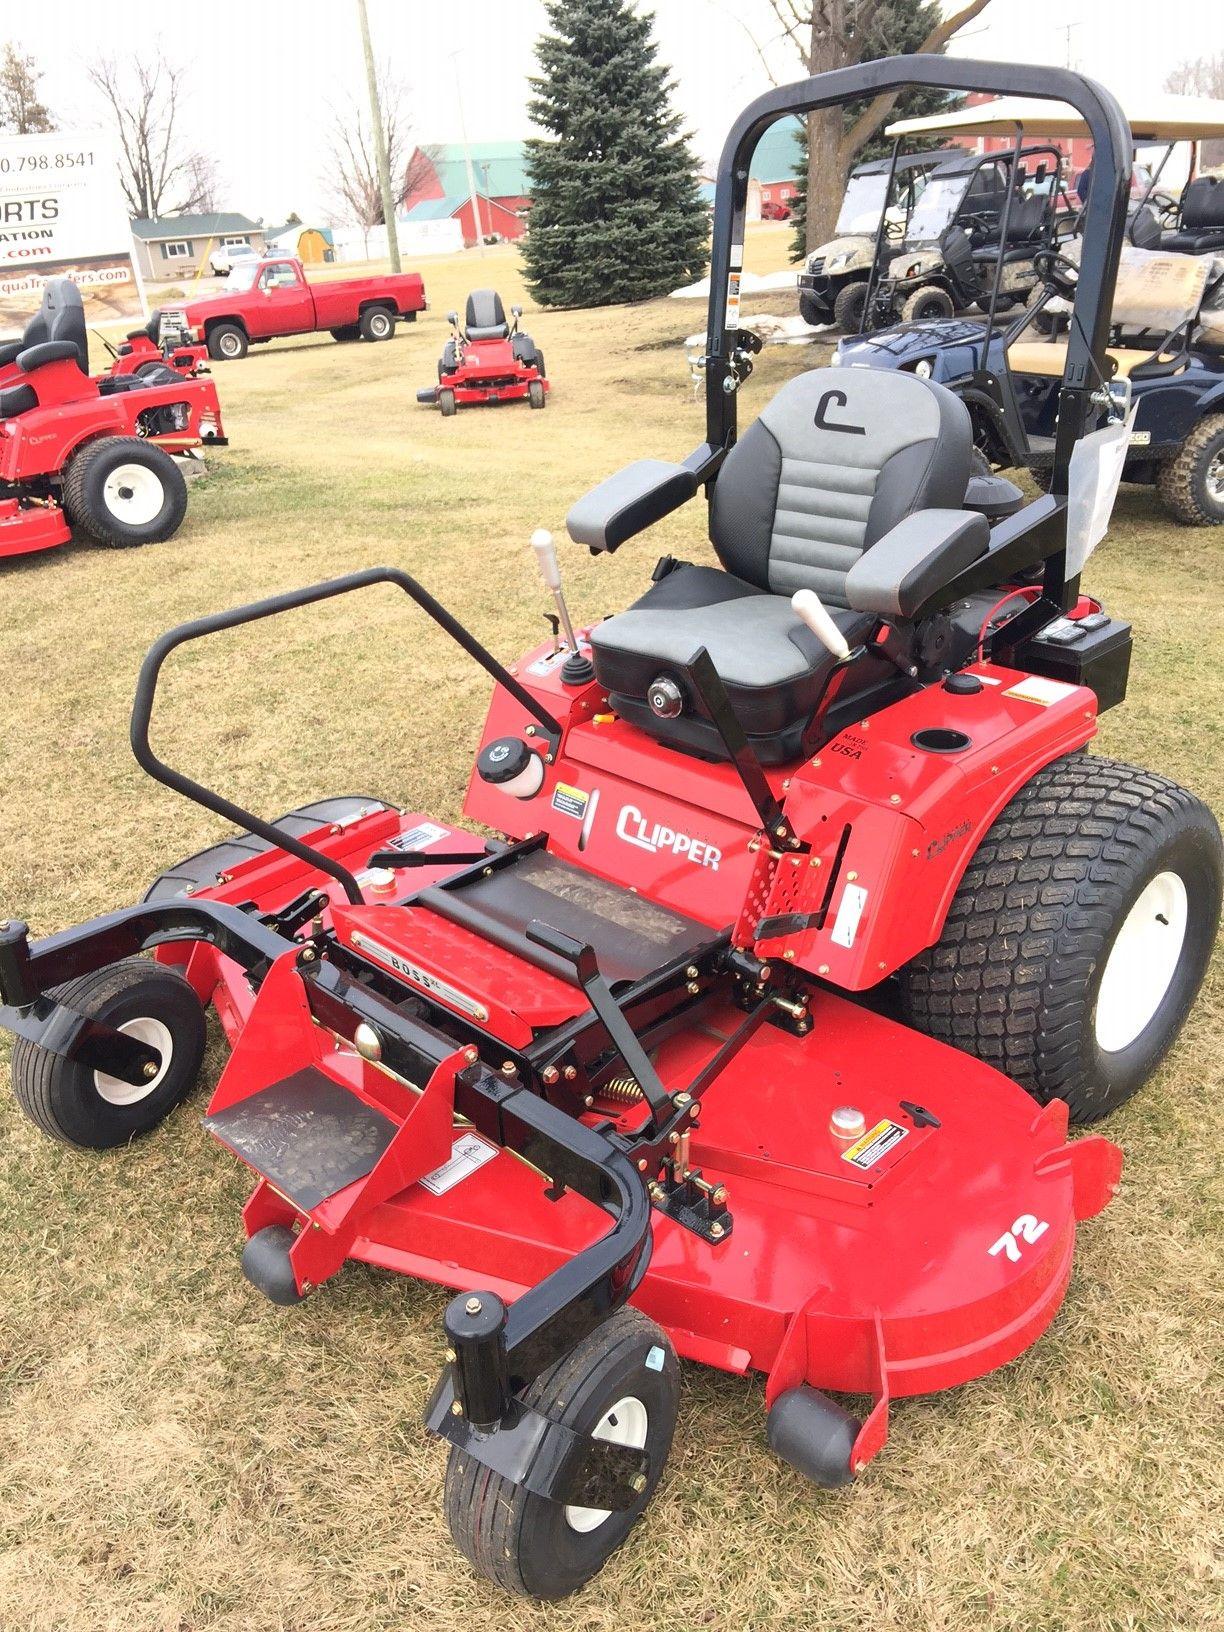 Boss Xl Country Clipper Zero Turn Lawn Mower Deck Flips Forward For Easy Maintenance Joy Stick For Control Of Move Zero Turn Lawn Mowers Lawn Mower Mower